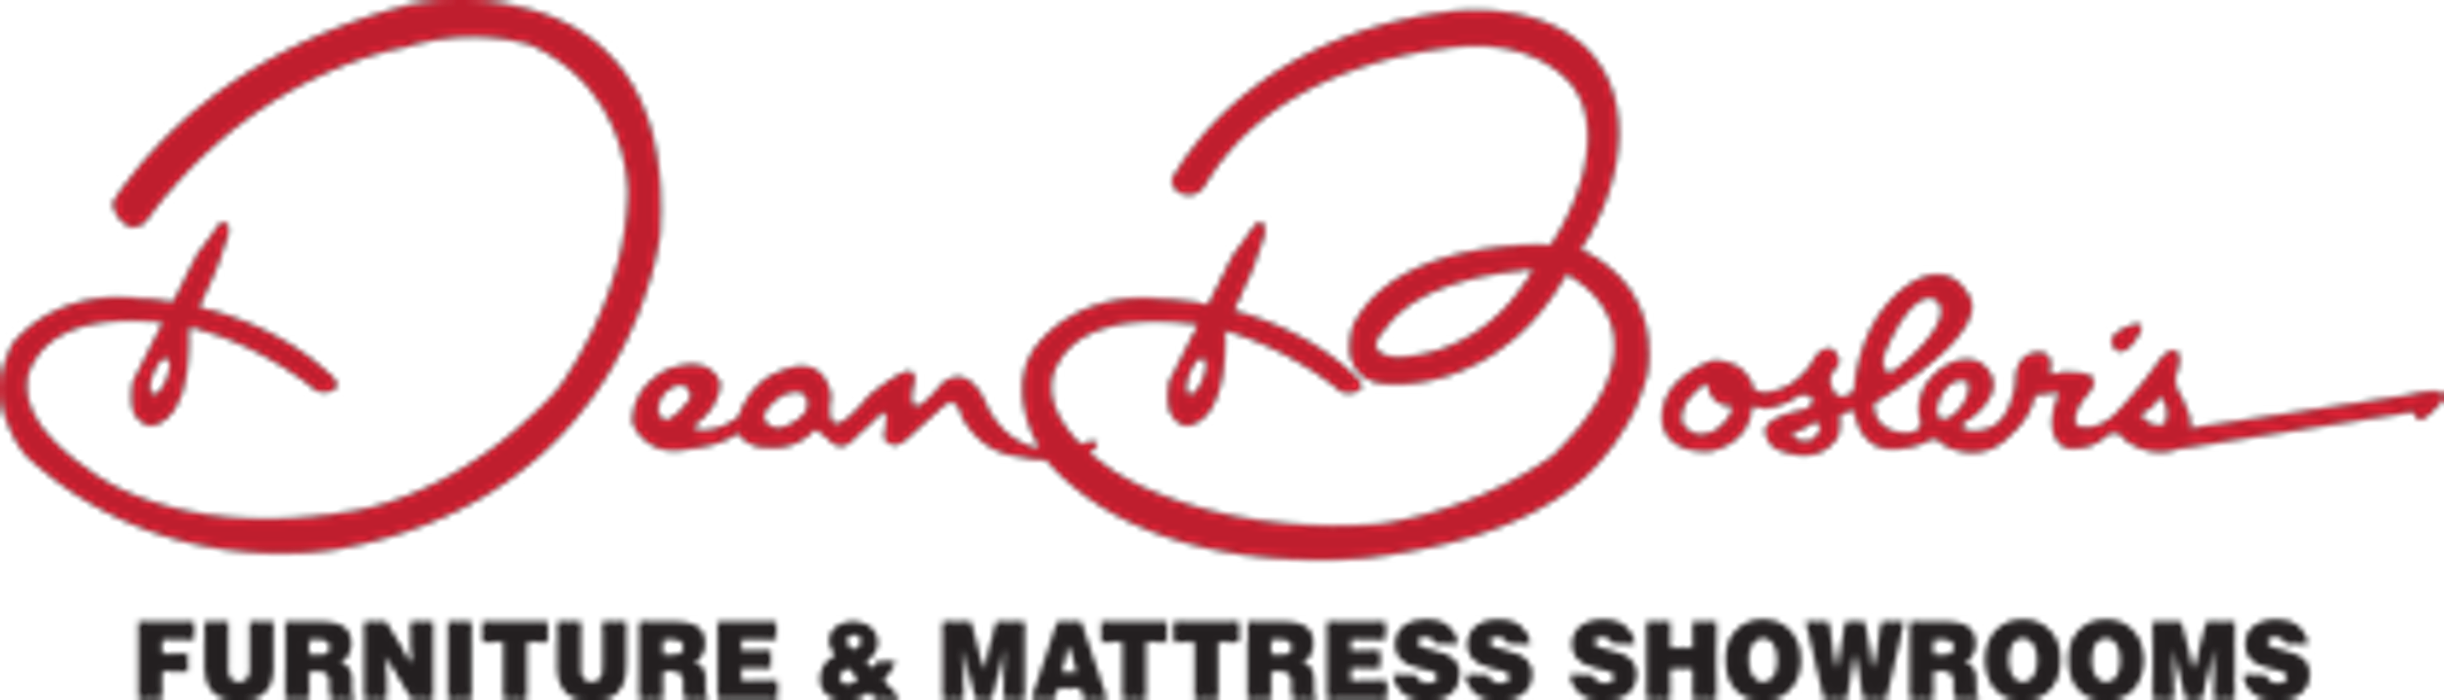 Dean Bosler's Furniture & Mattress Showroom - Evansville, IN